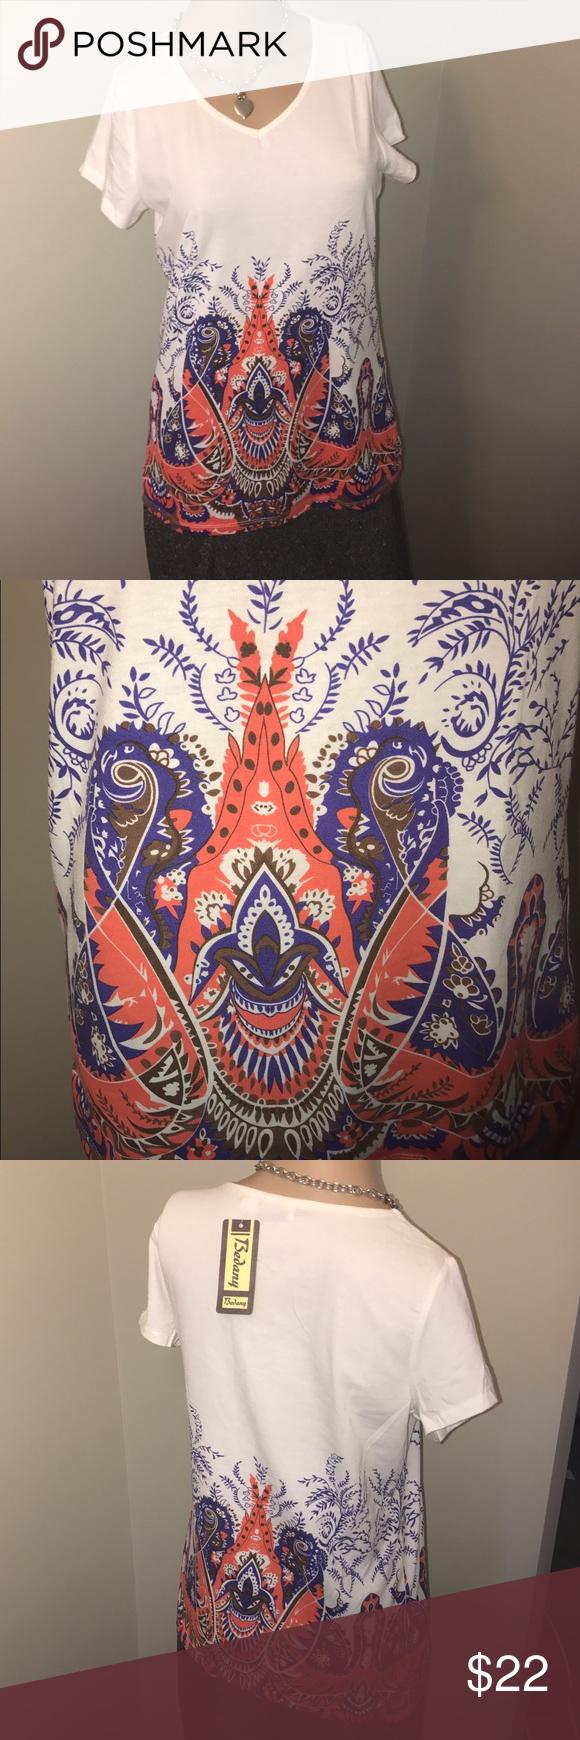 Shirt design measurements - Beautiful Bedany Boutique Tee T Shirt Boutique